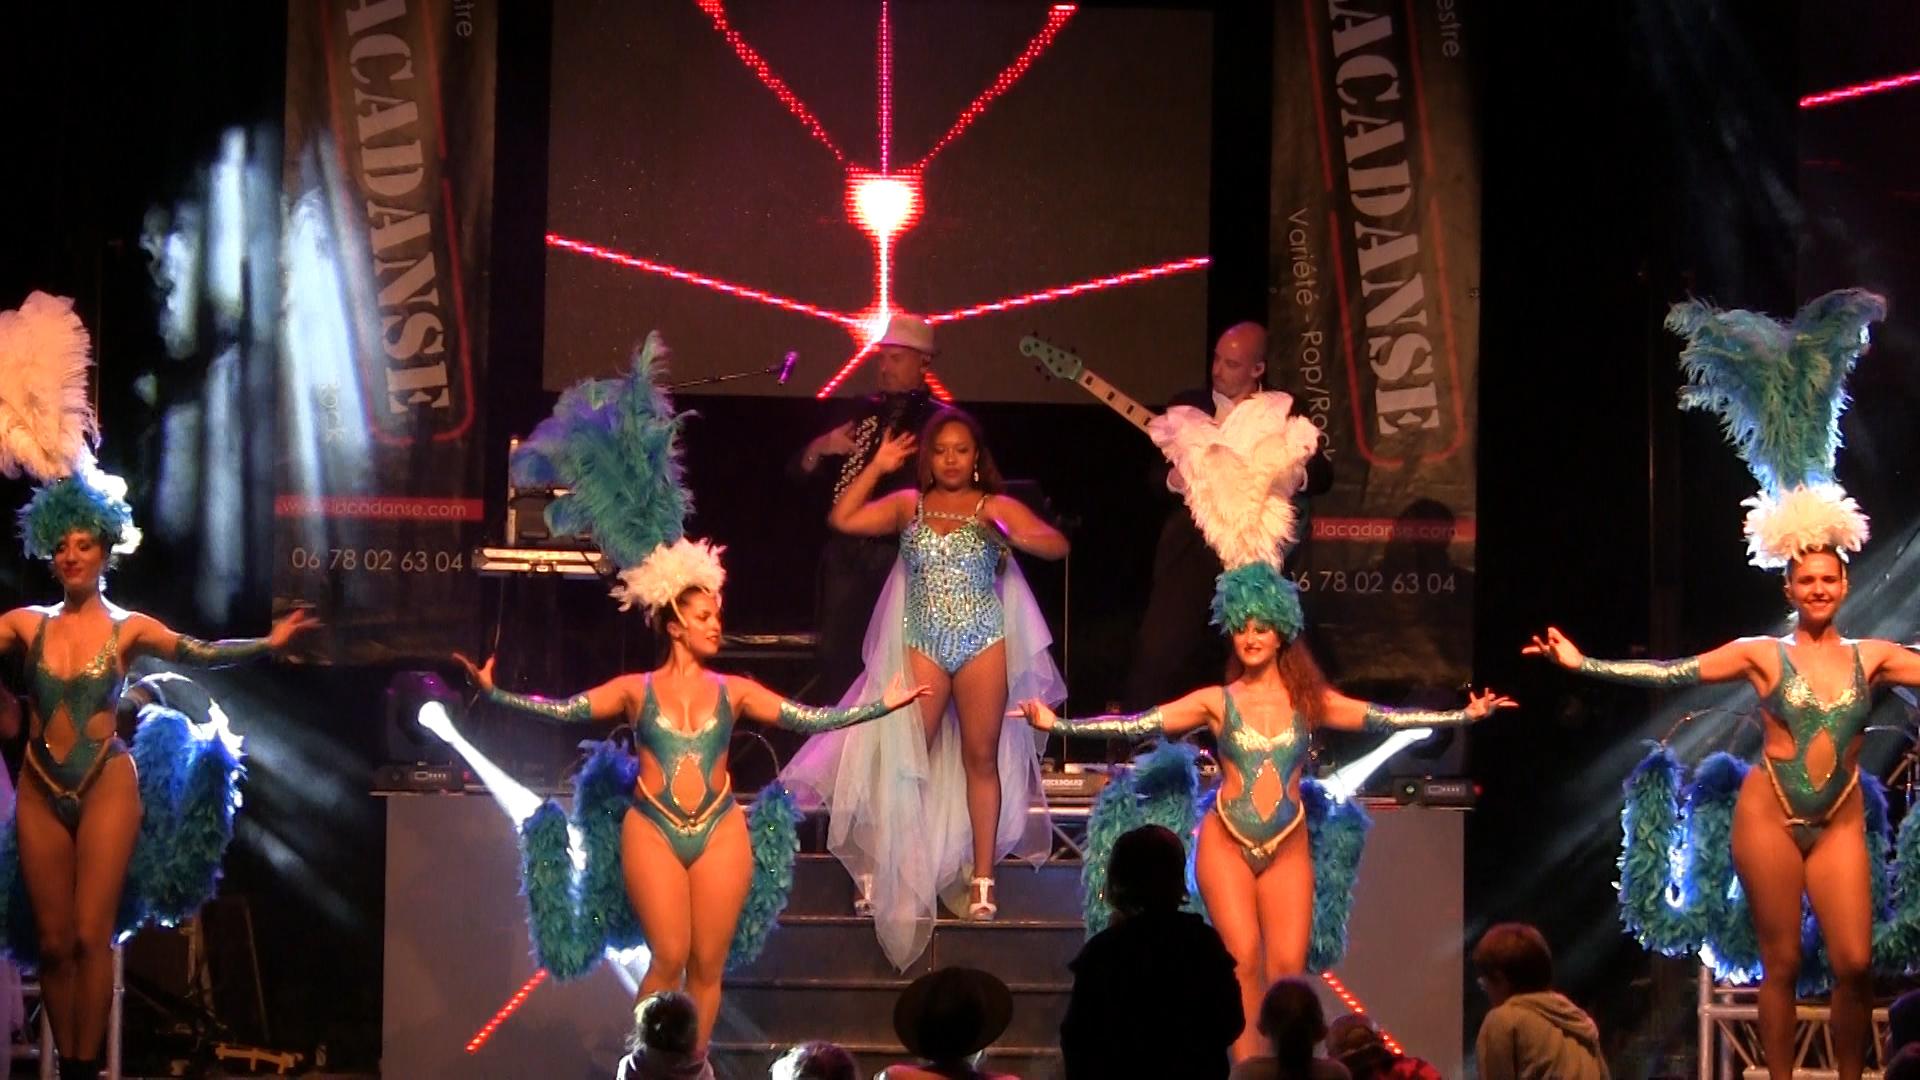 Spectacle cabaret 2019 Lacadanse